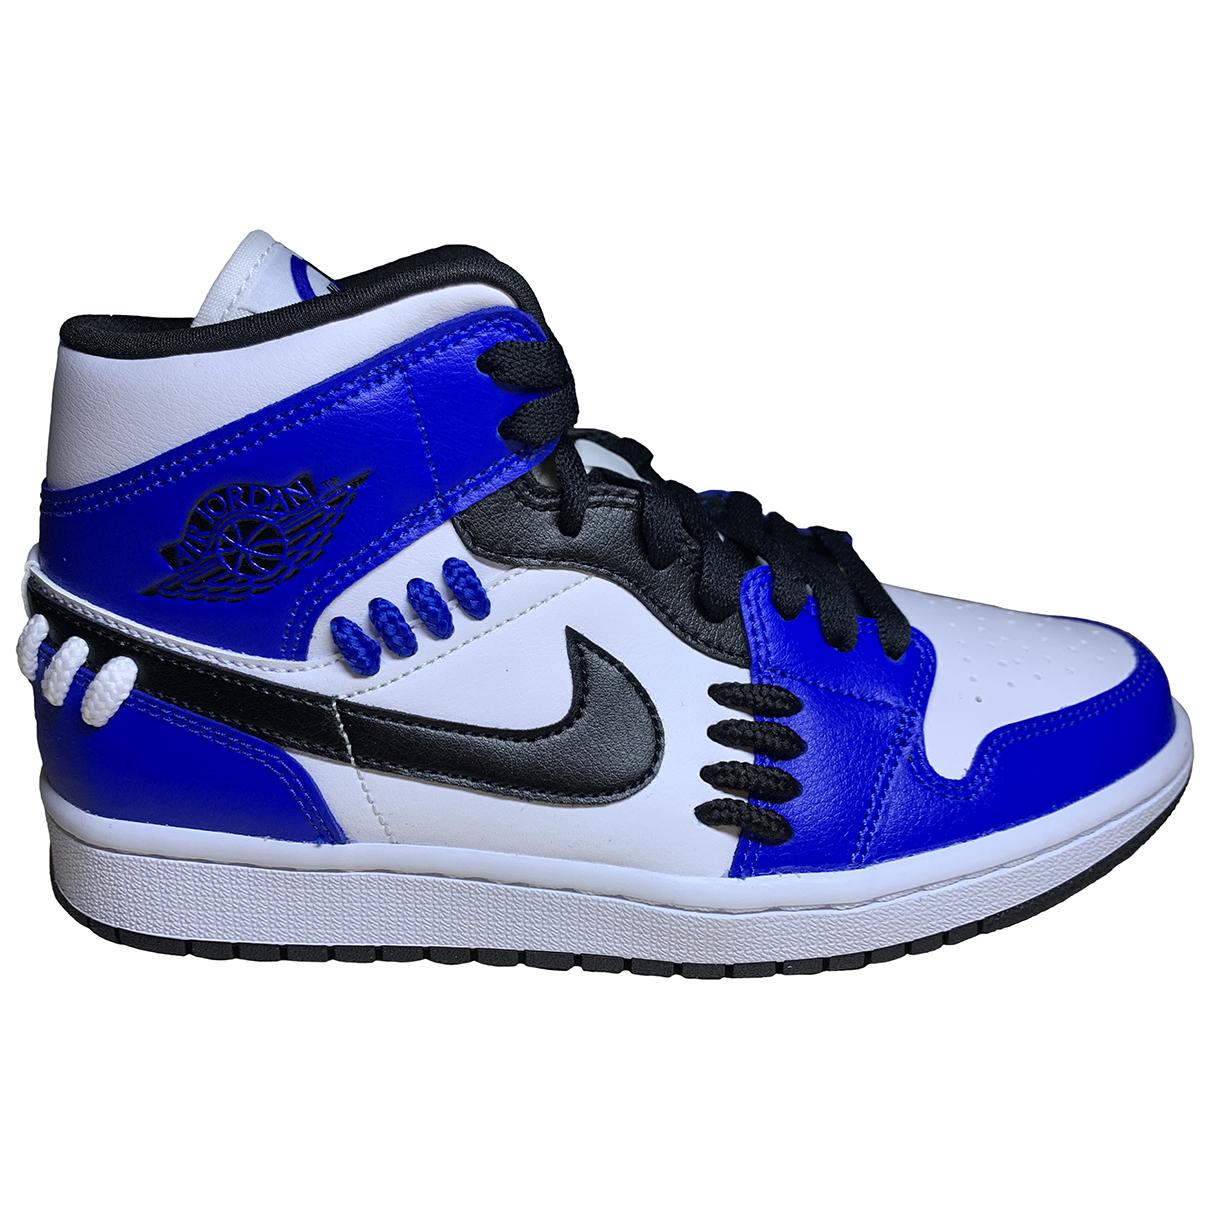 Jordan - Baskets Air Jordan 1  pour femme - bleu